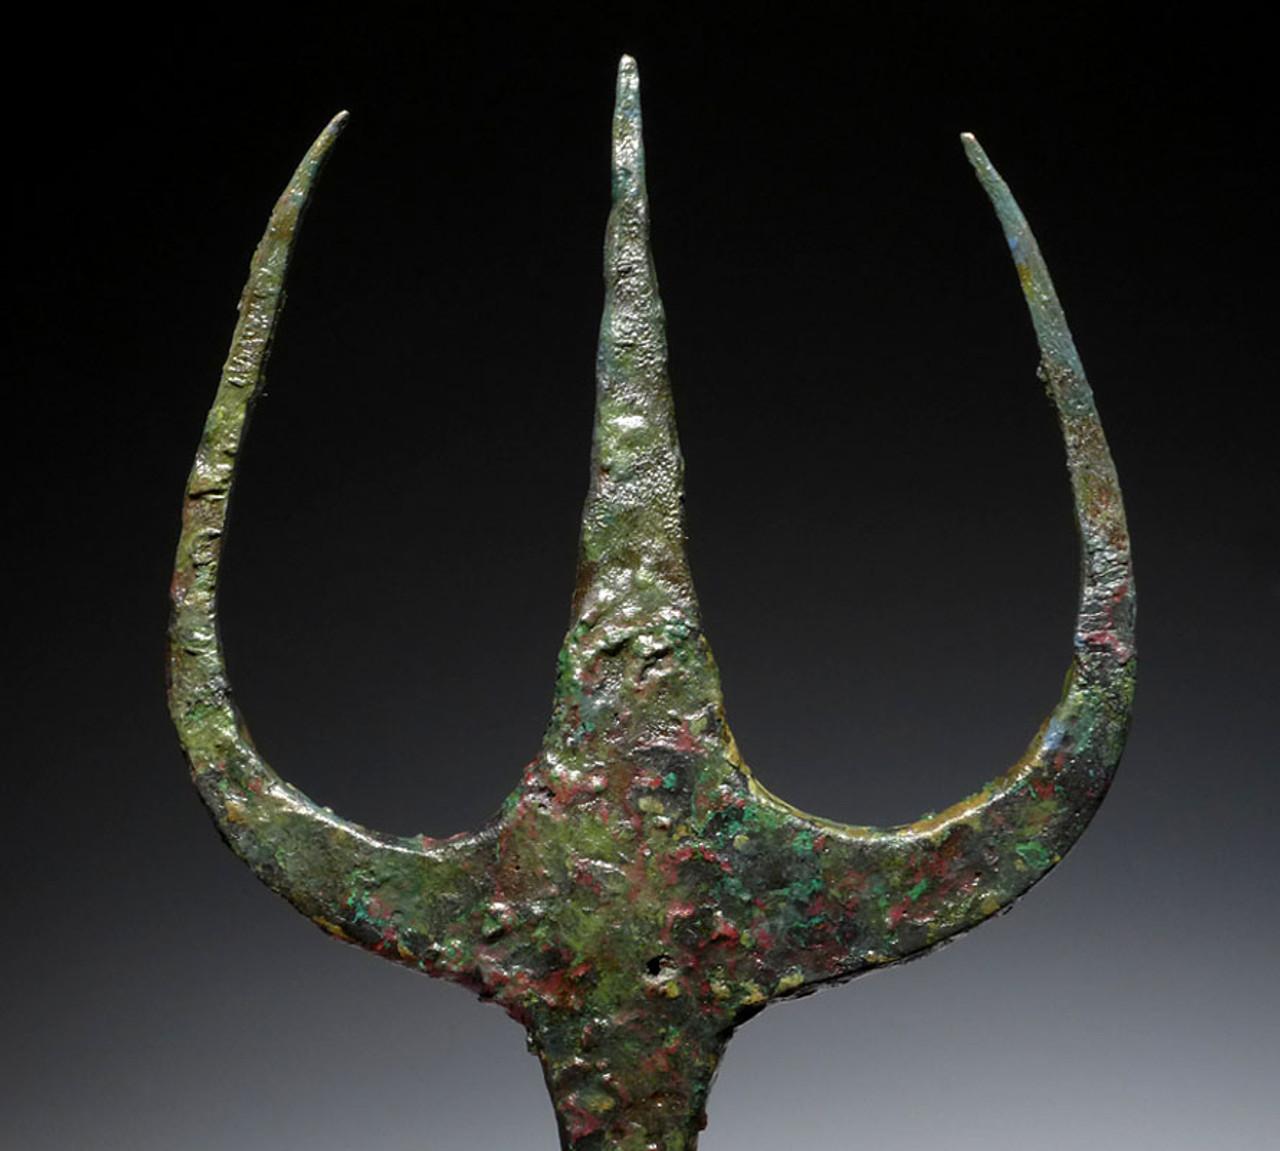 NE168 - ULTRA RARE ANCIENT BRONZE NEAR EASTERN LURISTAN TRIDENT SPEAR SET